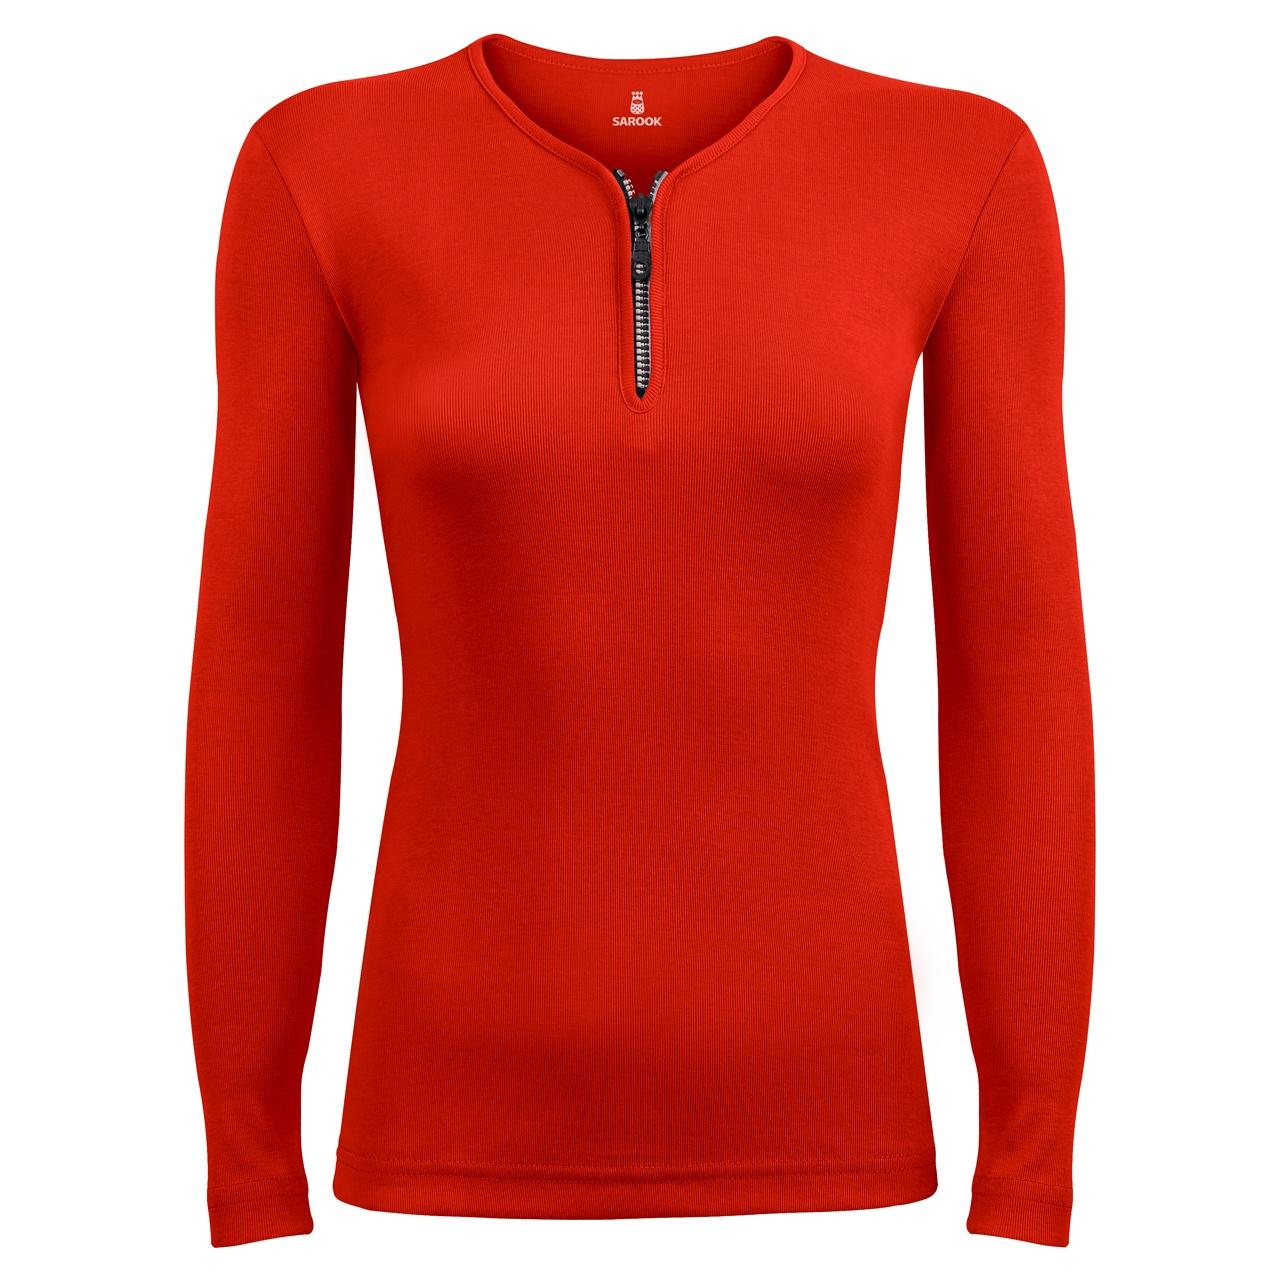 Photo of تی شرت آستین بلند زنانه ساروک مدل SZZiPDFR07 رنگ قرمز